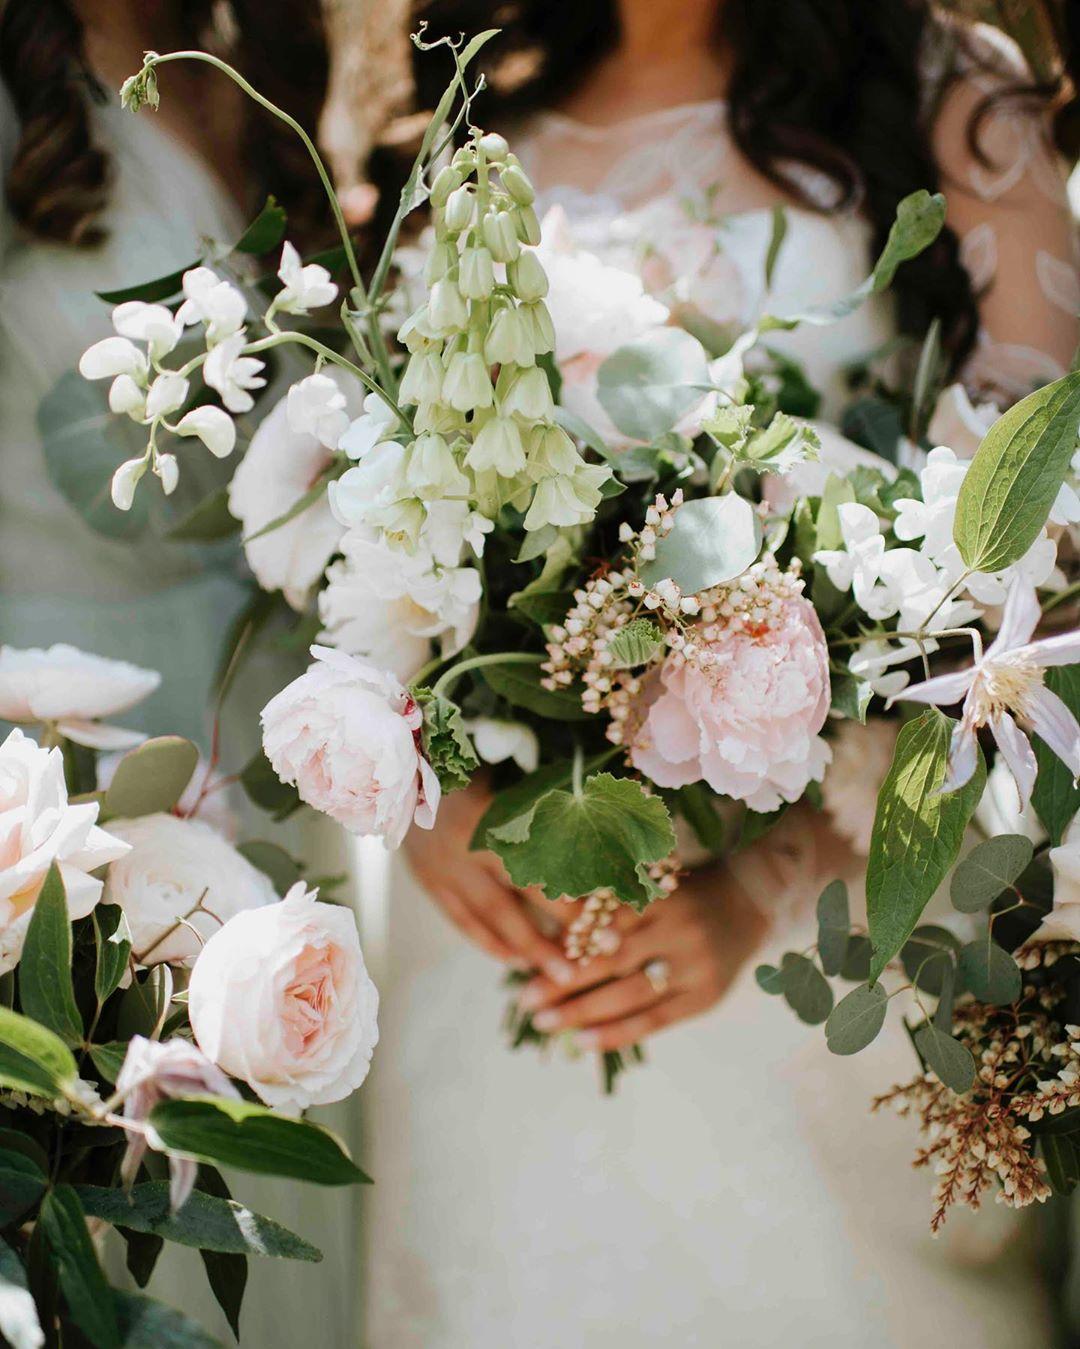 {ellie} photo | @amyspiritophotography . . #bride #bouquet #prettyflowers #lush #natural #weddingday #lotusfloraldesigns #flowers #weddingflowers #ido #love